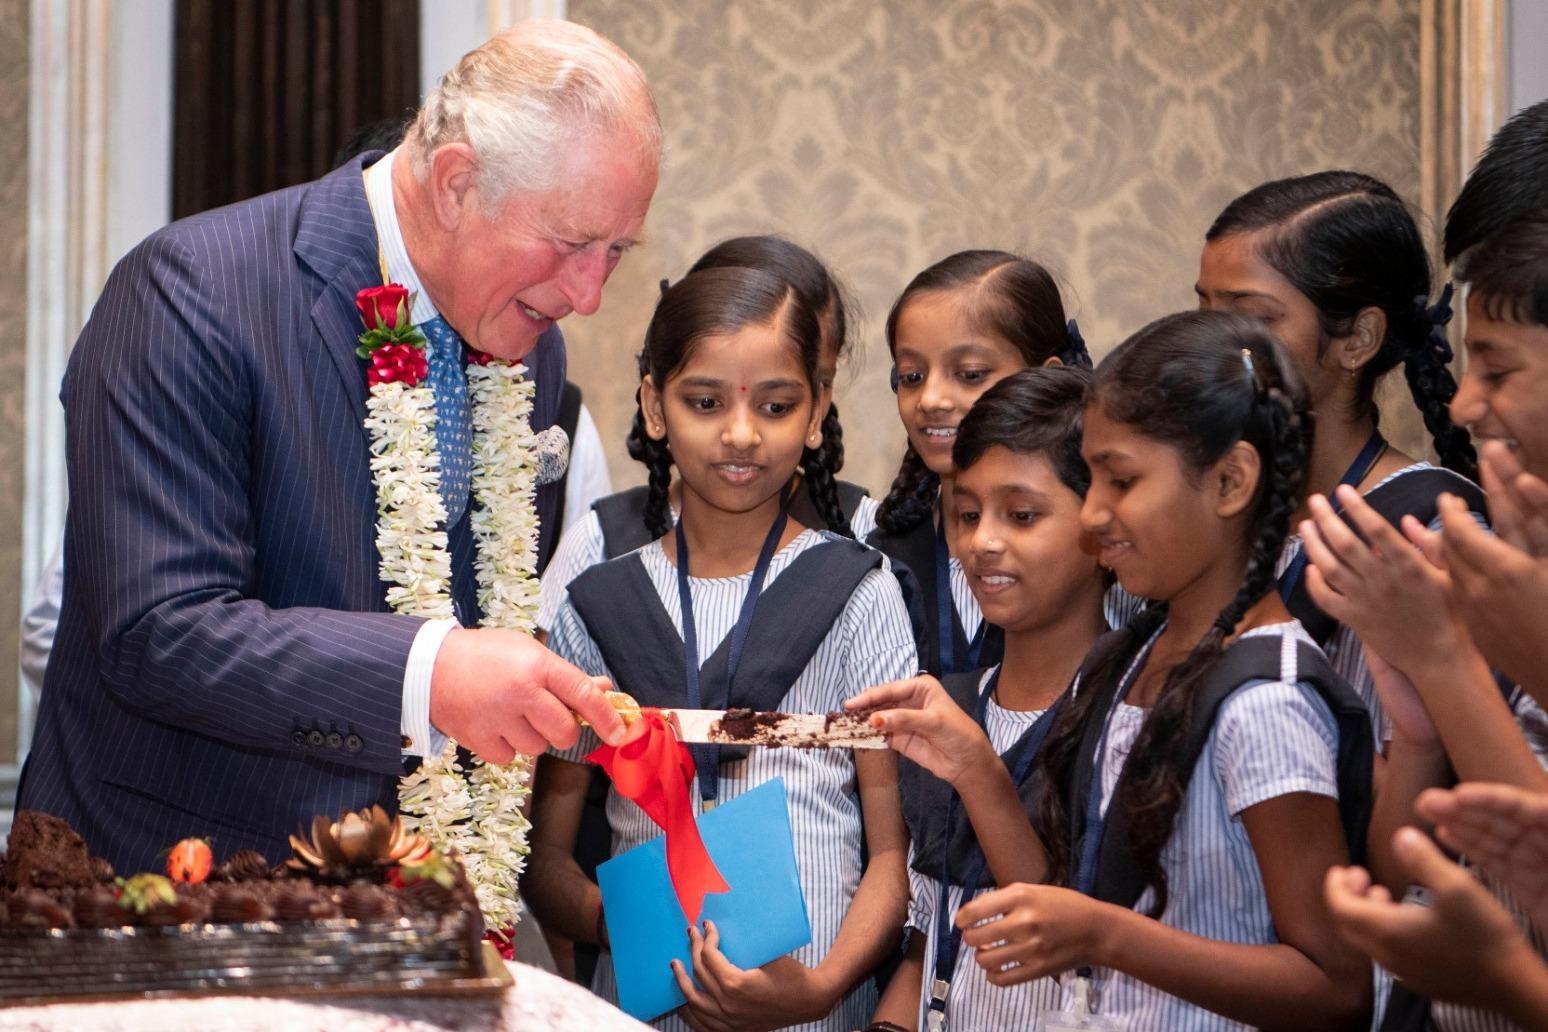 CHARLES GIVEN FAIRY GARDENS AS BIRTHDAY GIFT FROM MUMBAI SCHOOLCHILDREN